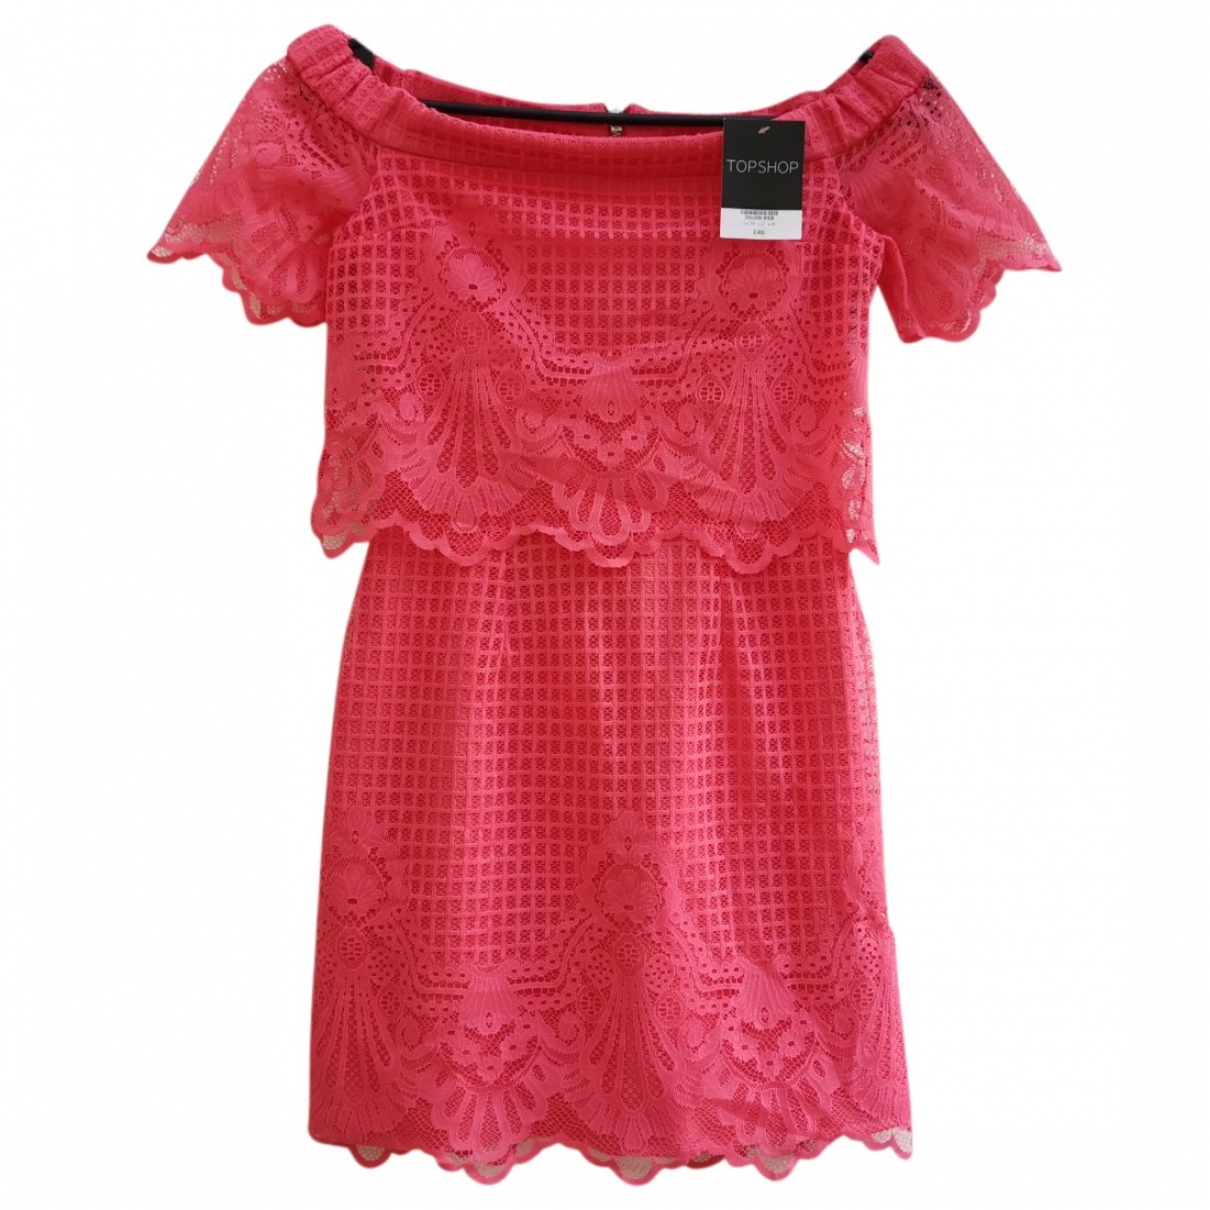 Topshop - Robe   pour femme - rose